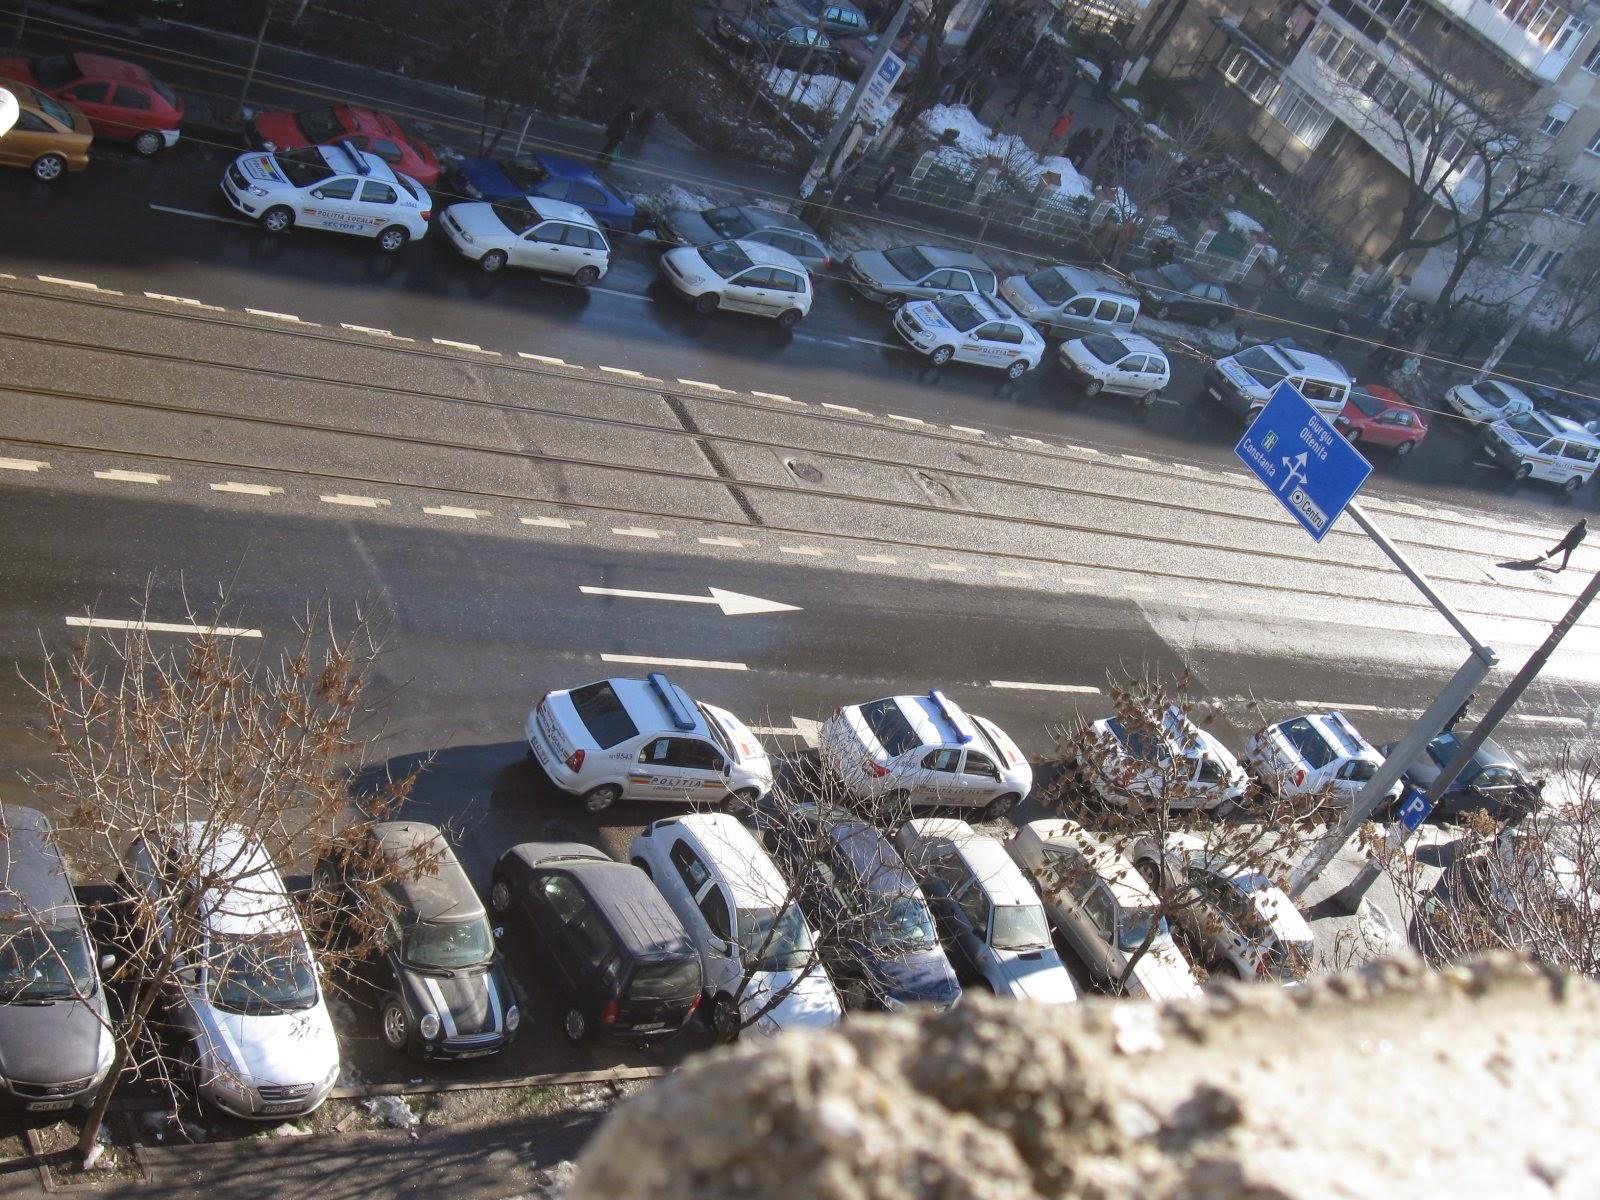 politia locala sector 3 parcare ilegala